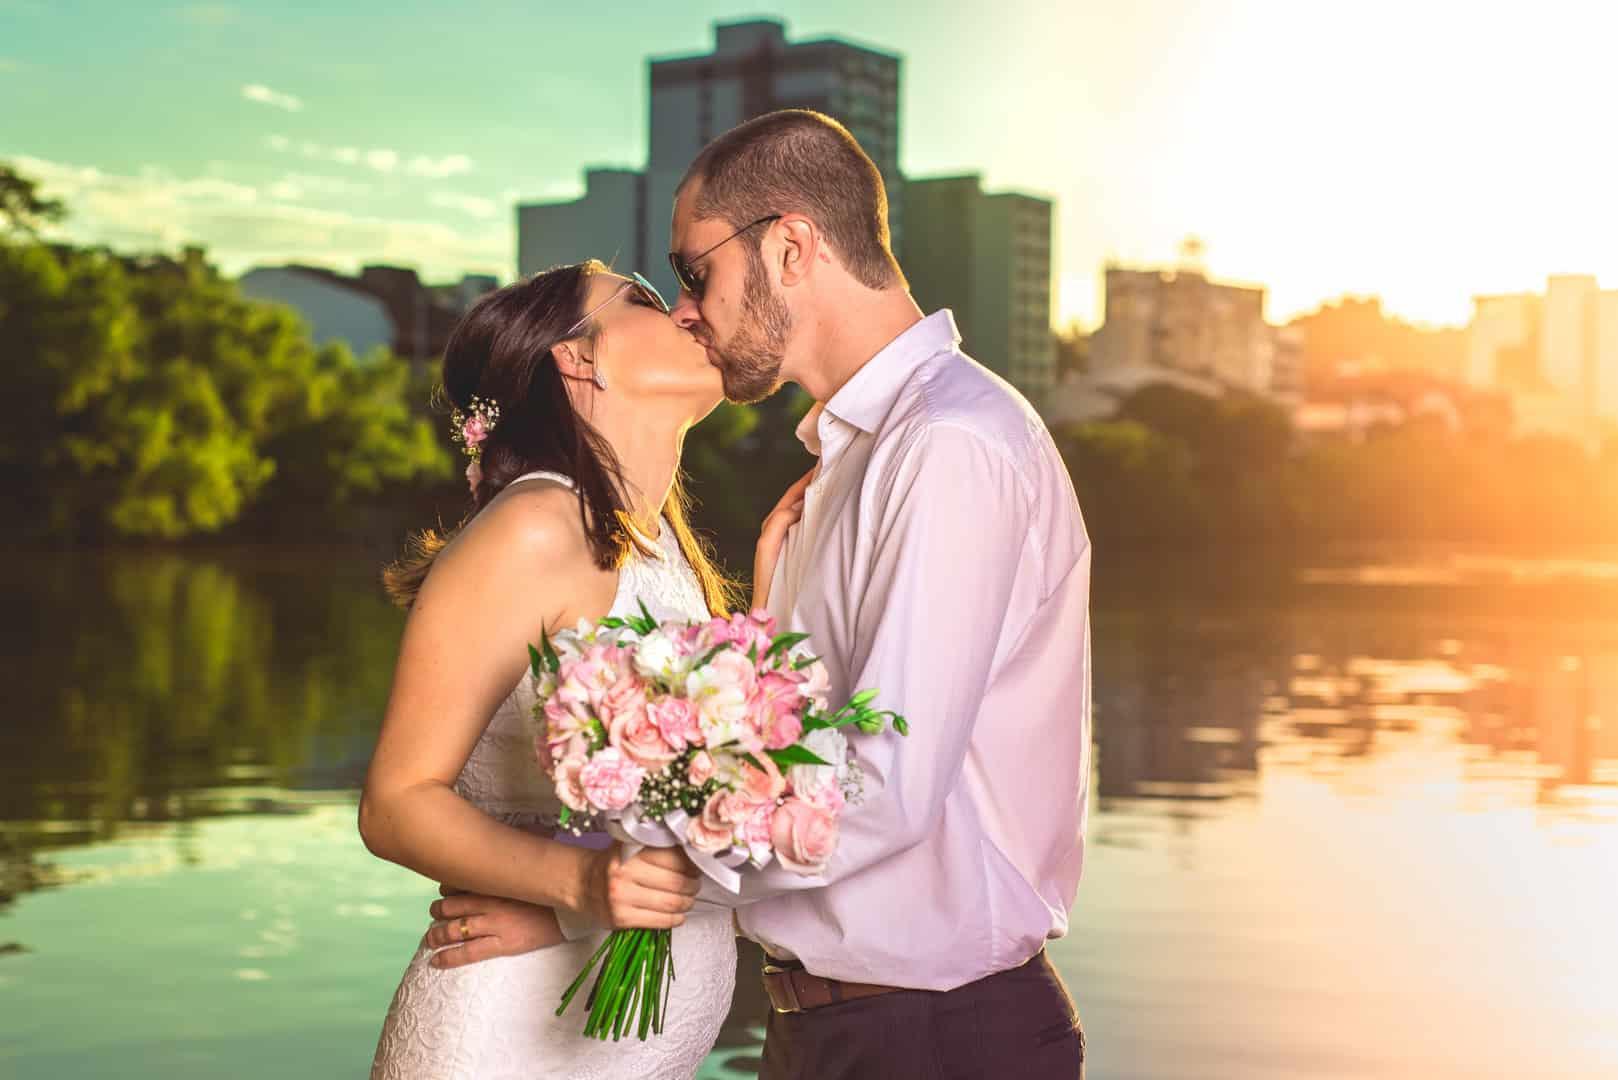 foto casamento civil blumenau fotografo jackson ullmann